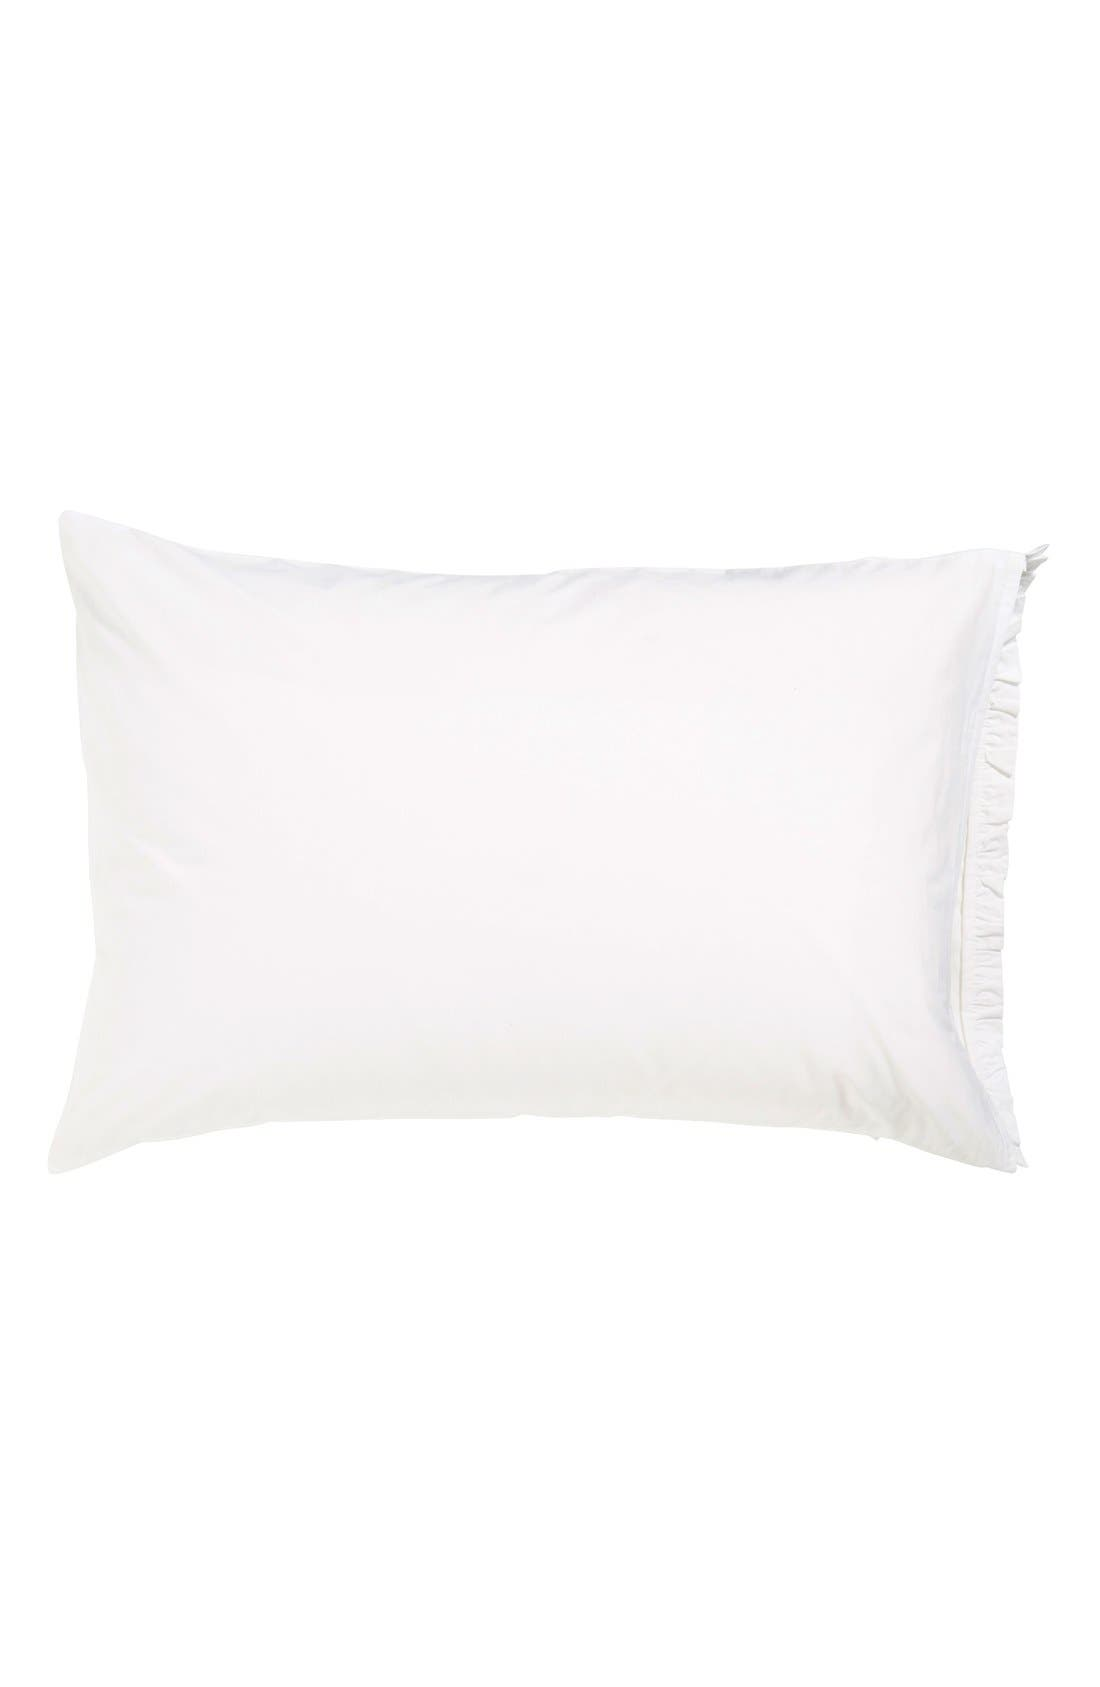 Alternate Image 2  - Amity Home 'Petite Ruffle' Linen Pillowcases (Set of 2)